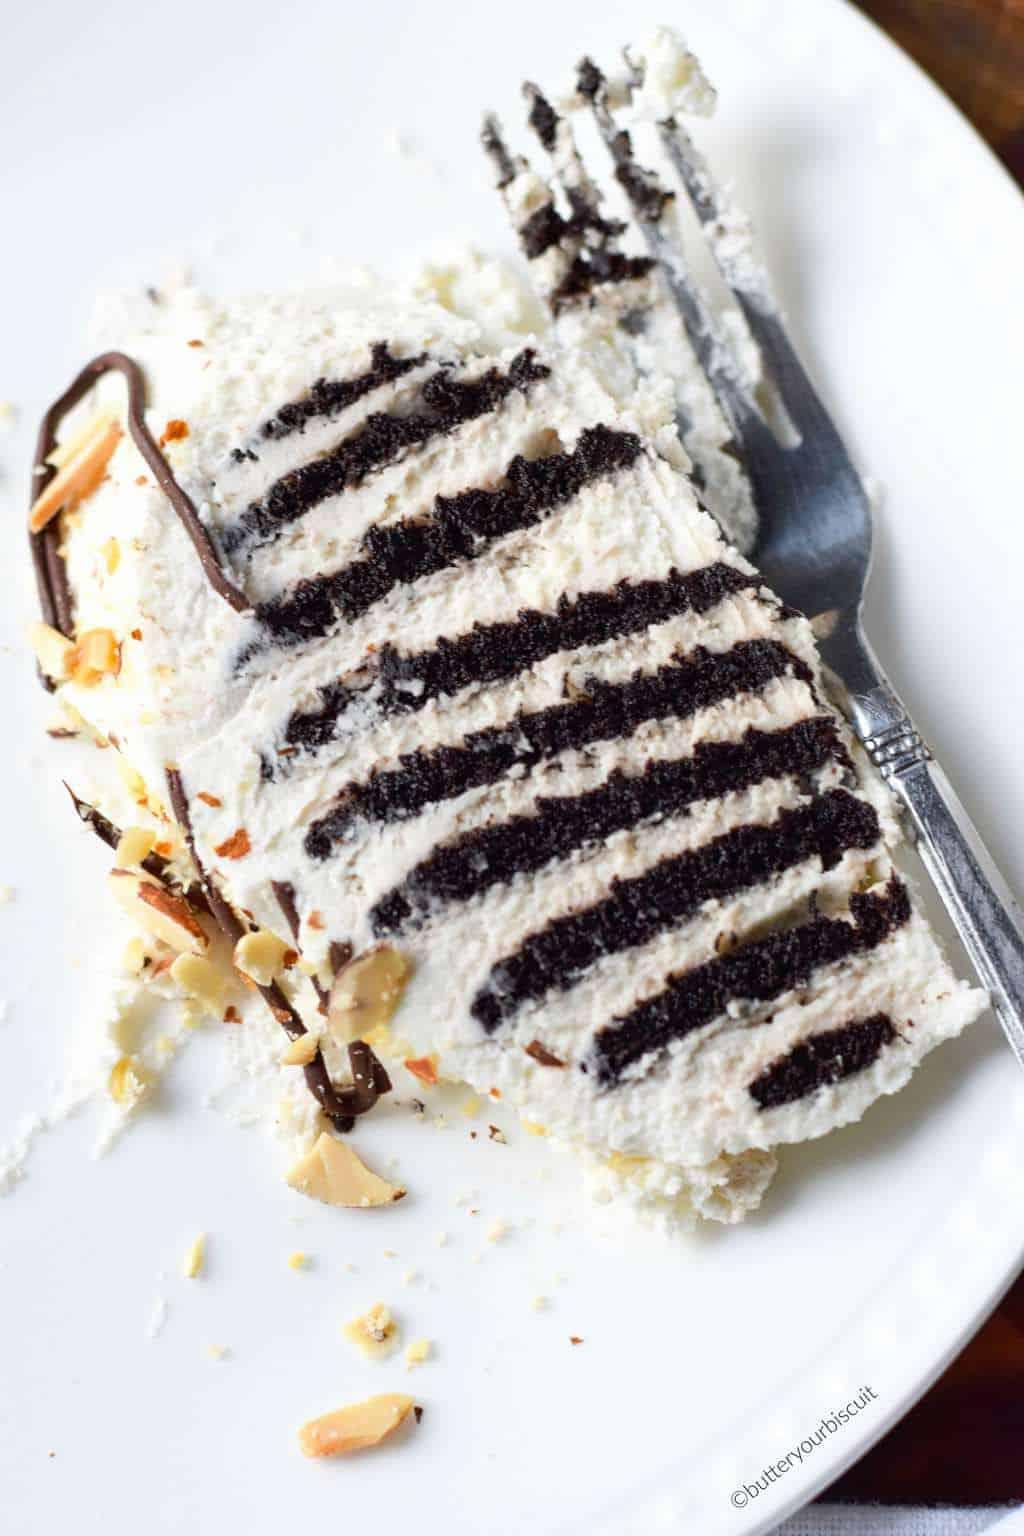 Chocolate Vanilla Pudding Icebox Cake Recipe